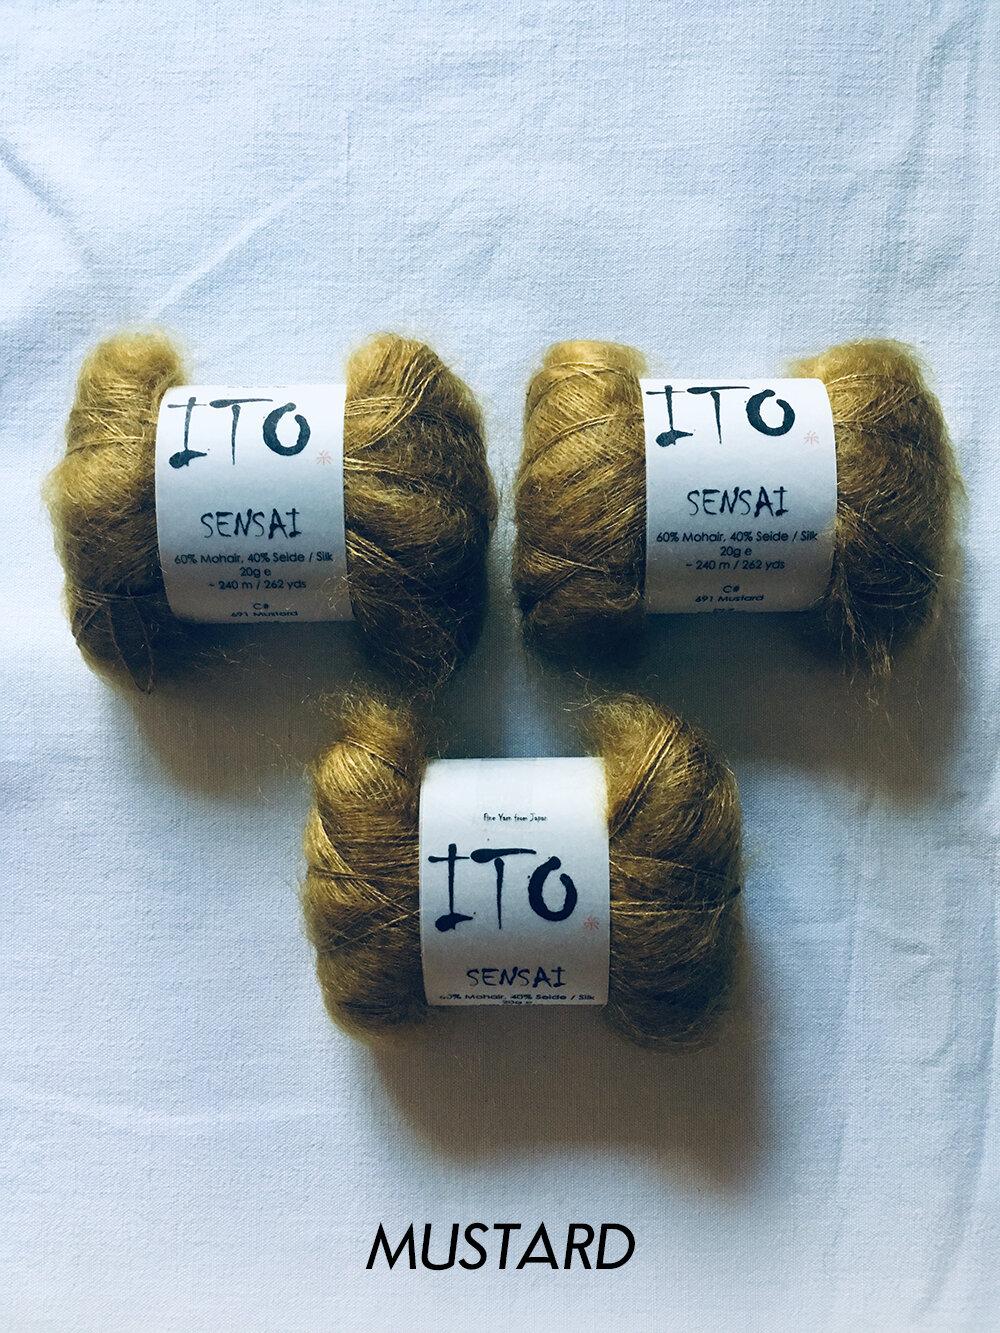 ito_sensai_mustard_691_wool_done_knitting.jpg